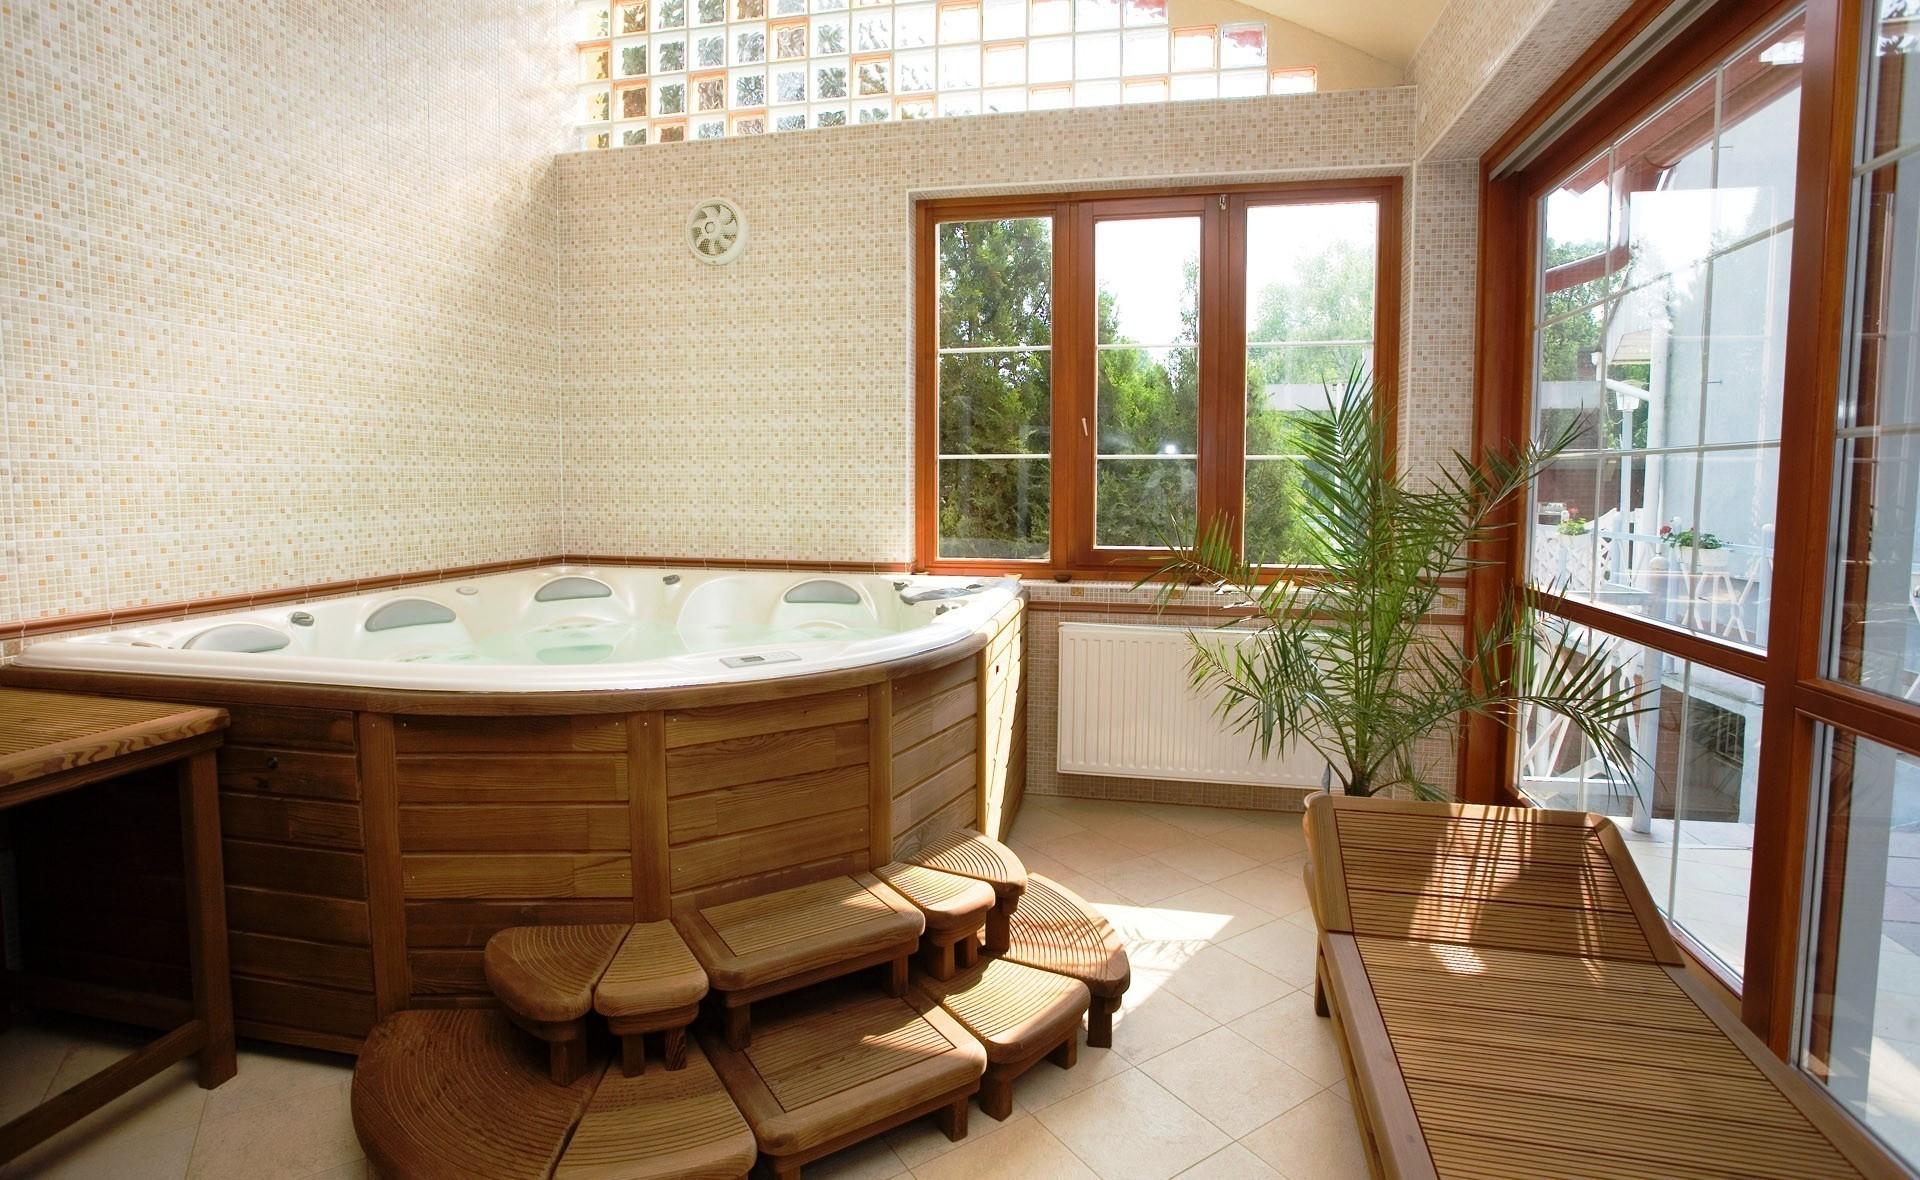 ванна, окно, плитка